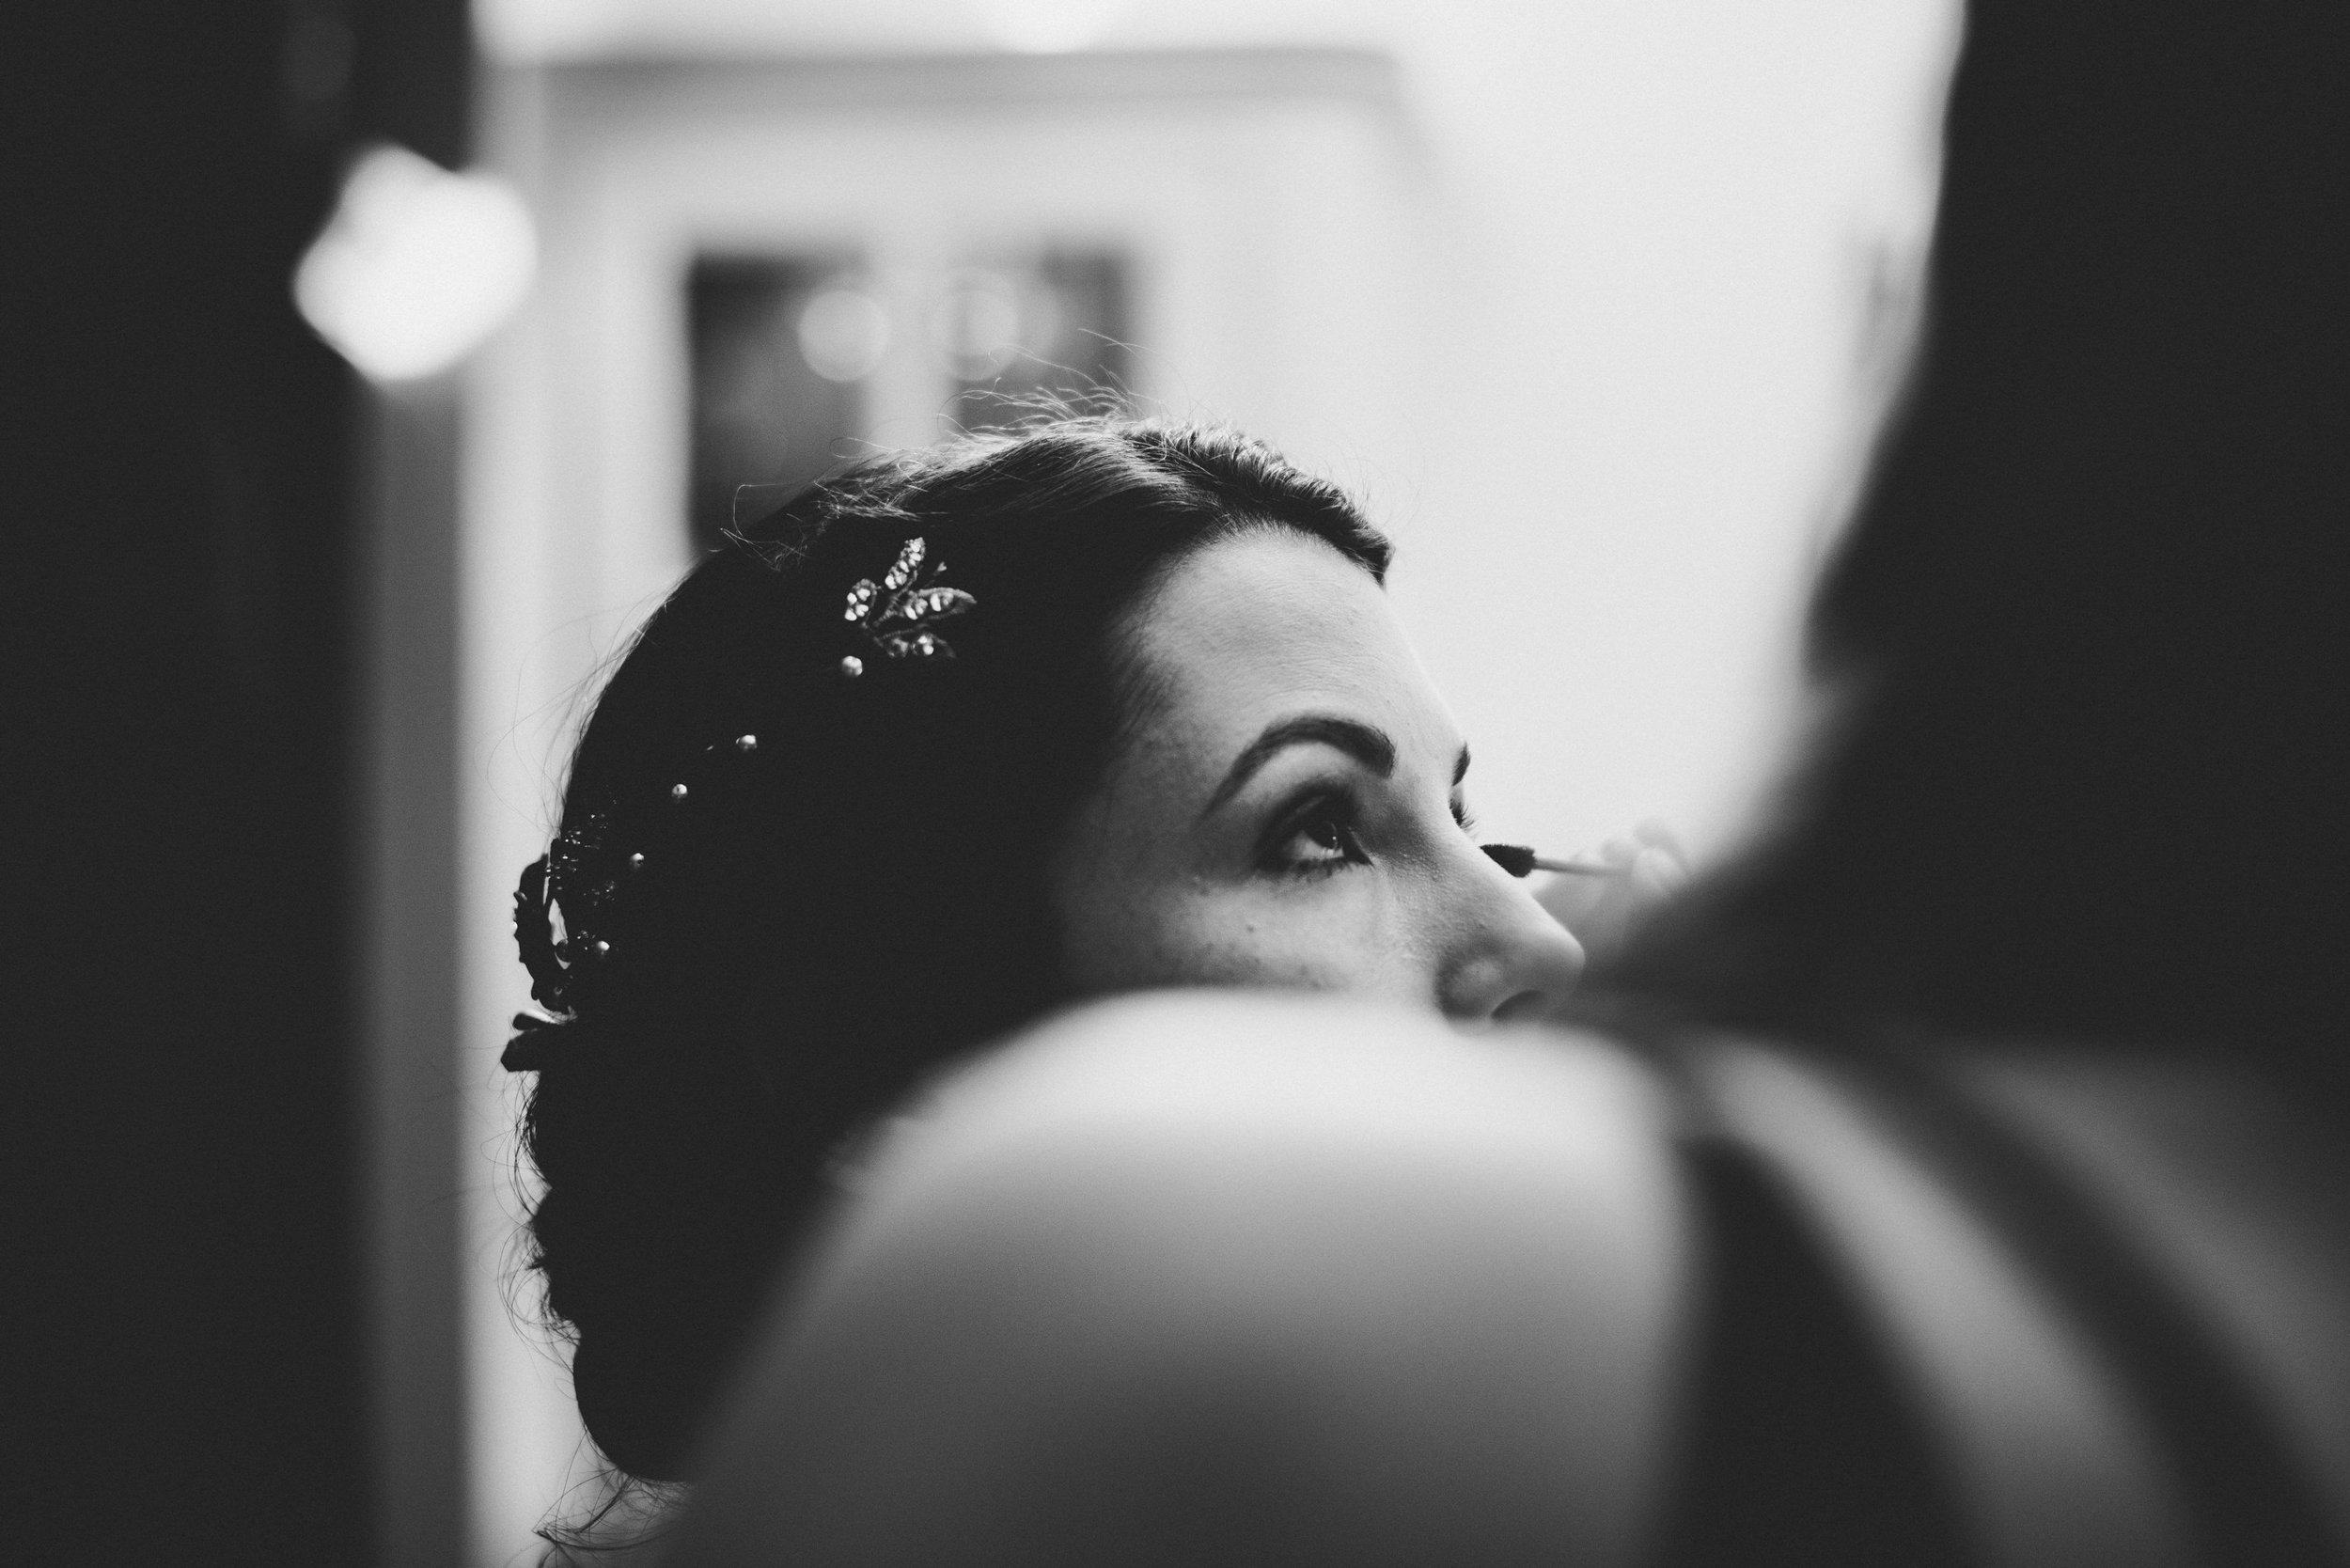 0014-LISA-DEVINE-PHOTOGRAPHY-ALTERNATIVE-WEDDING-PHOTOGRAPHY-SCOTLAND-DESTINATION-WEDDINGS-GLASGOW-WEDDINGS-COOL-WEDDINGS-STYLISH-WEDDINGS.JPG